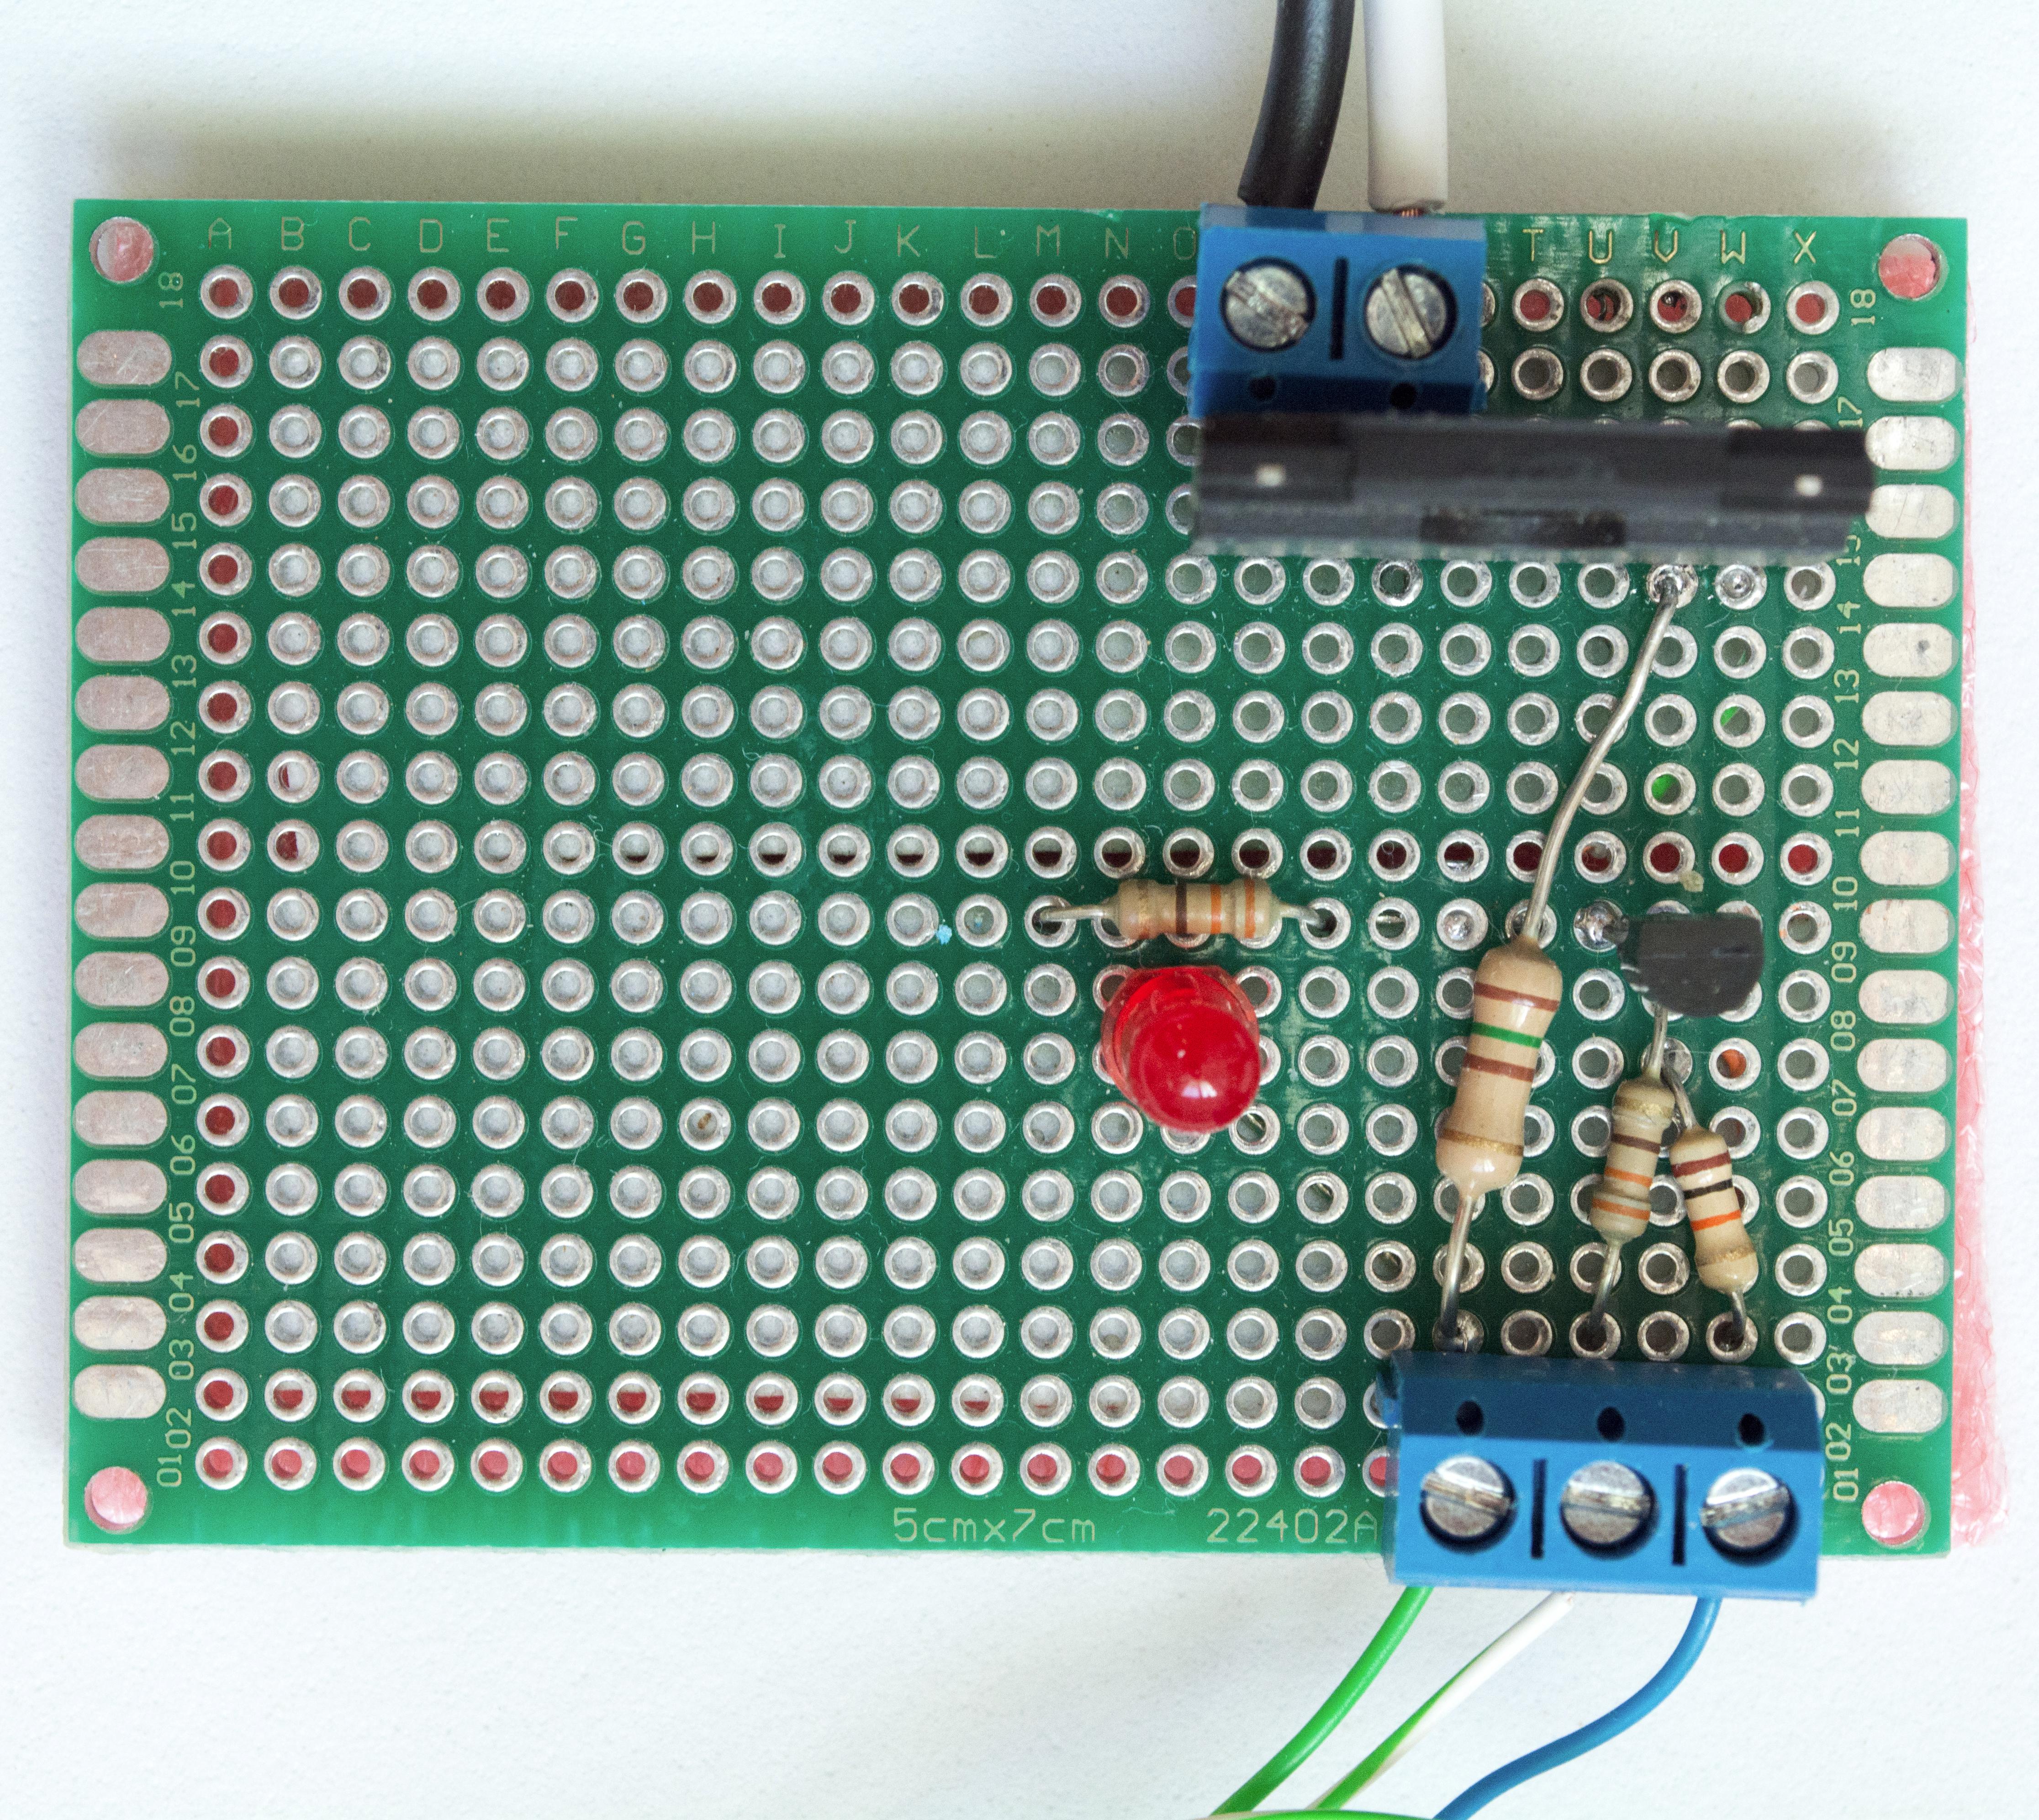 Emergency Phone Call Alert To An Arduino Via Asterisk Pbx Relay Wiring S108t02 Circuit